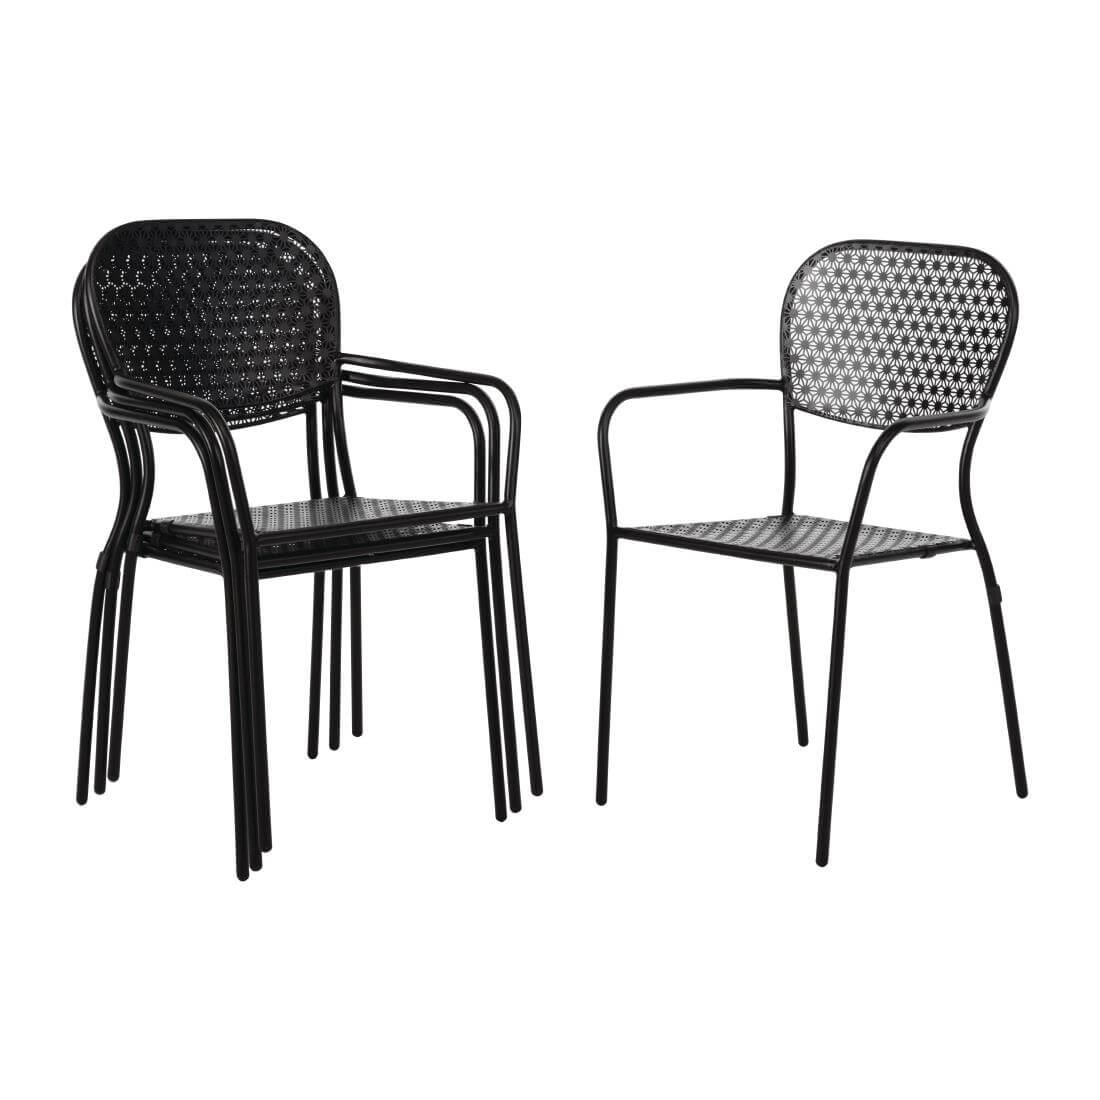 Steel Patterned Chair - Black or Grey